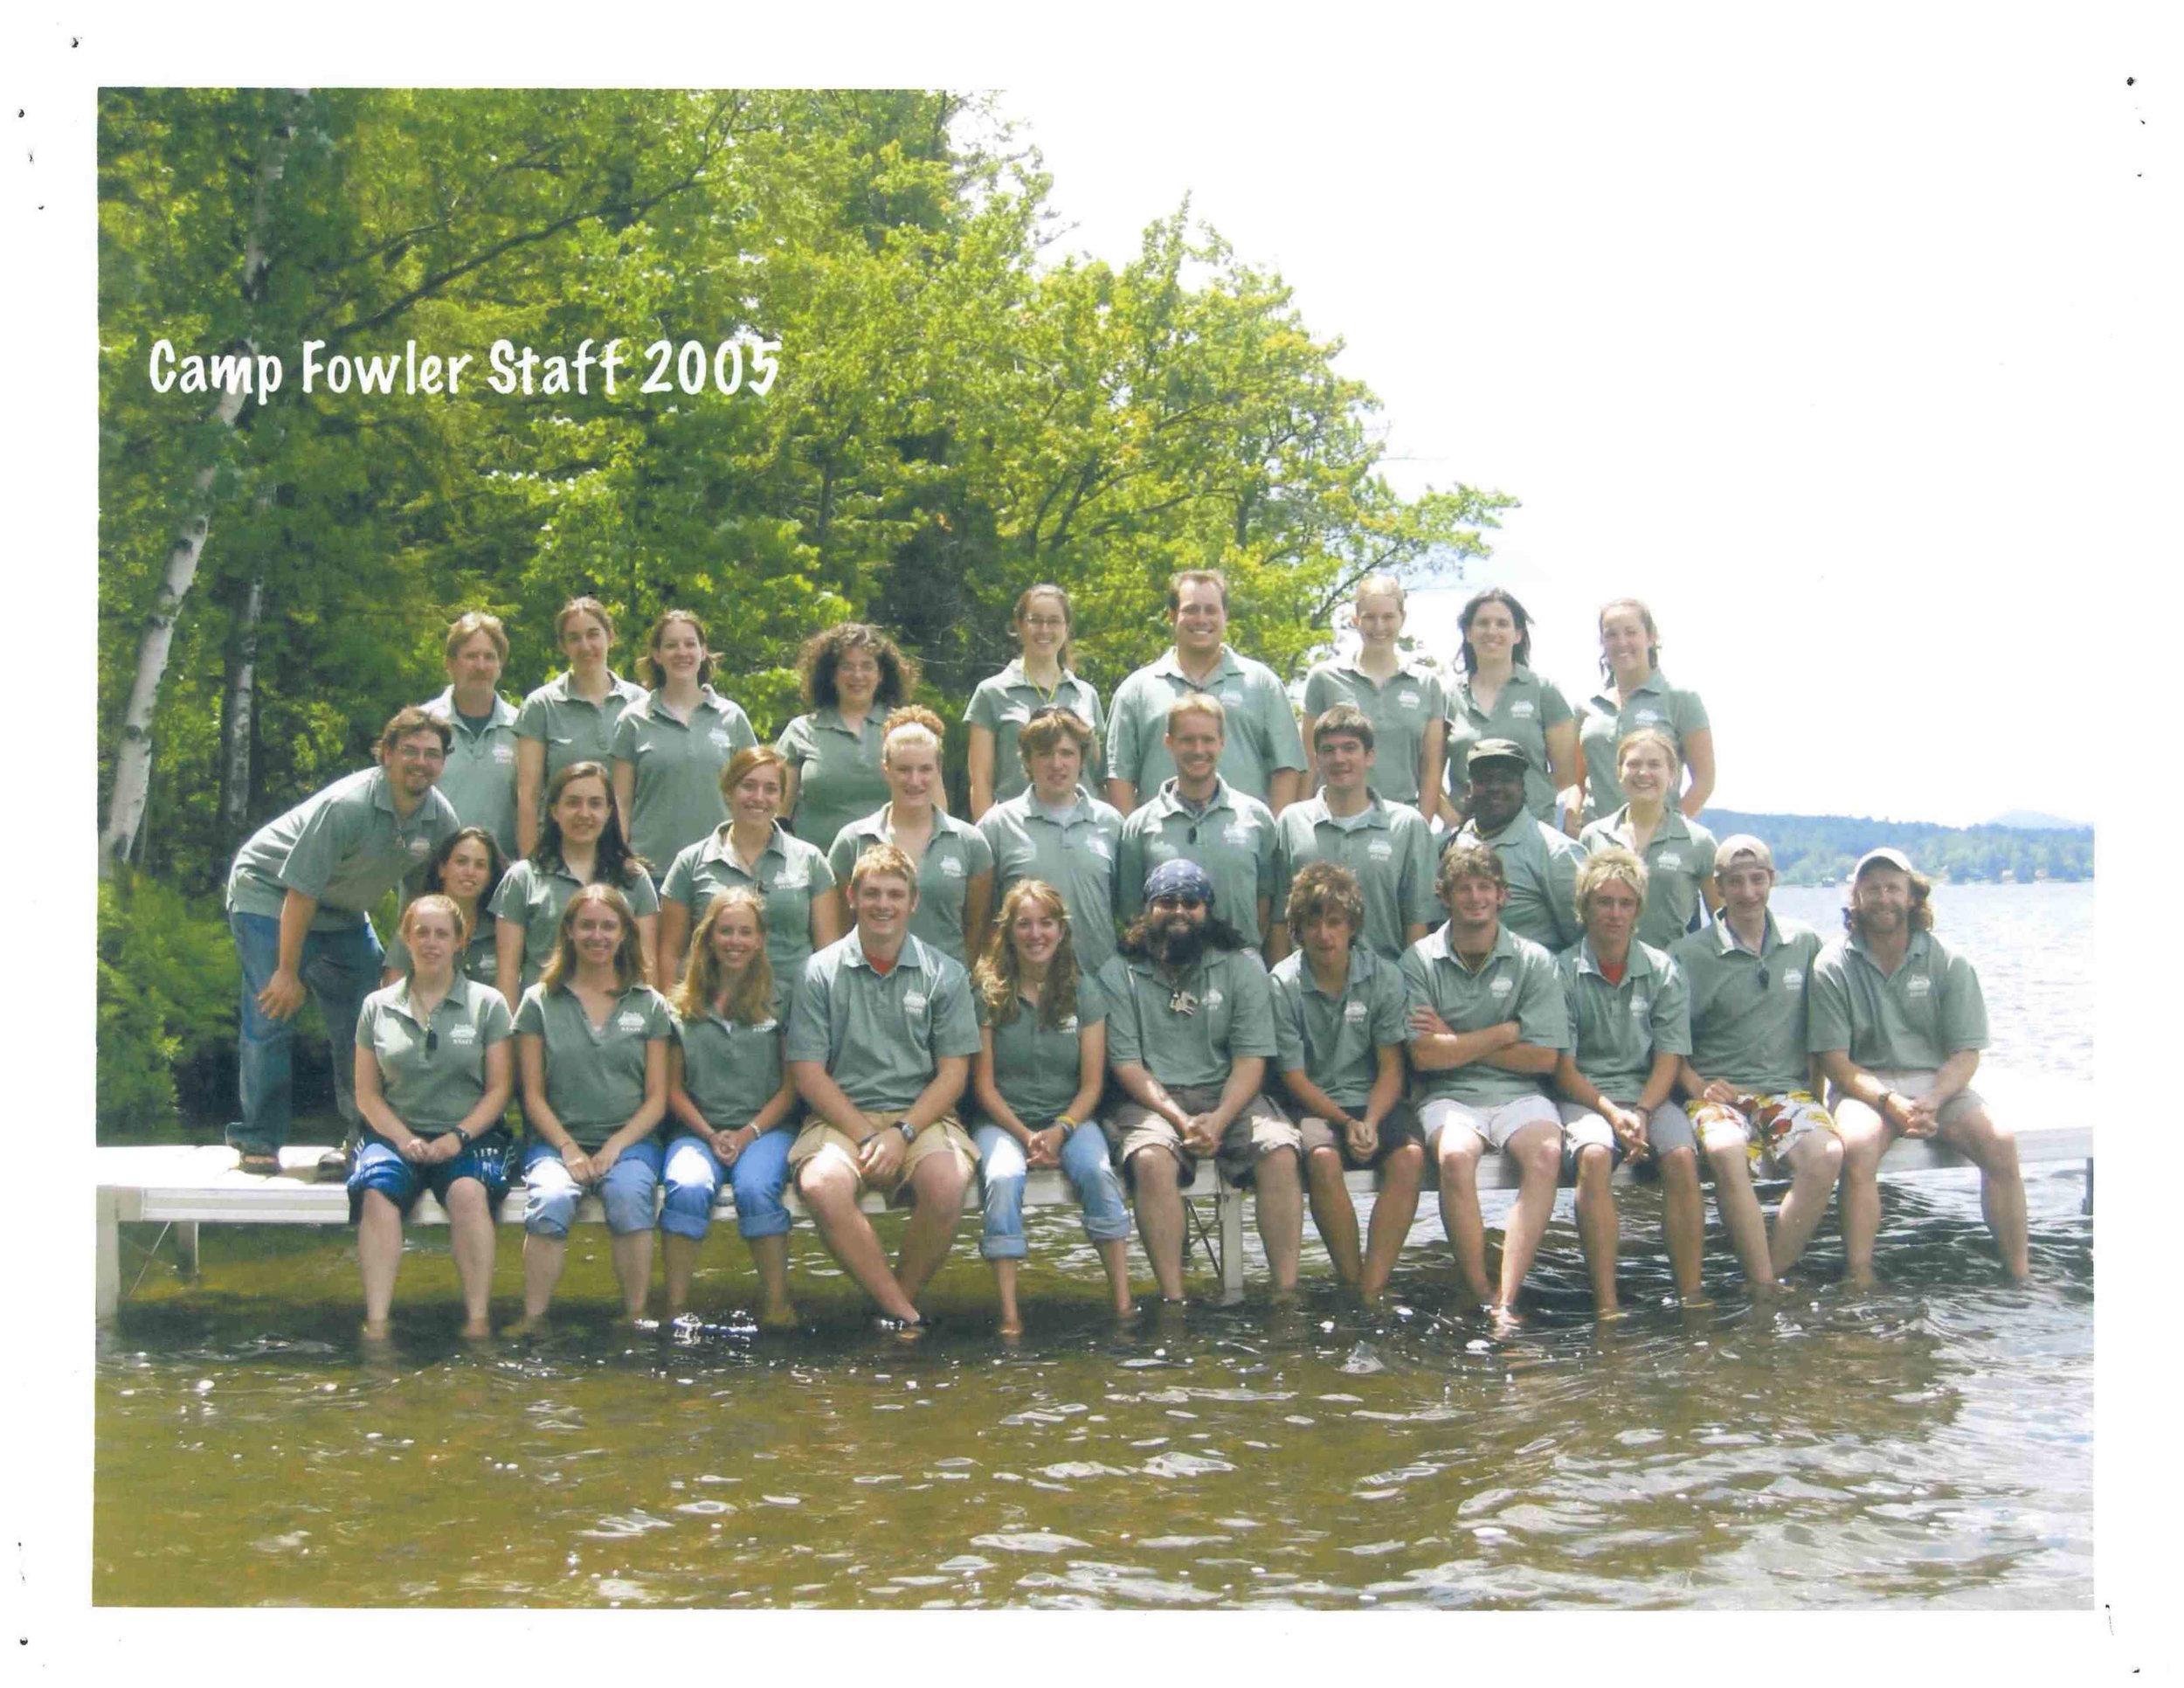 staff2005.jpg